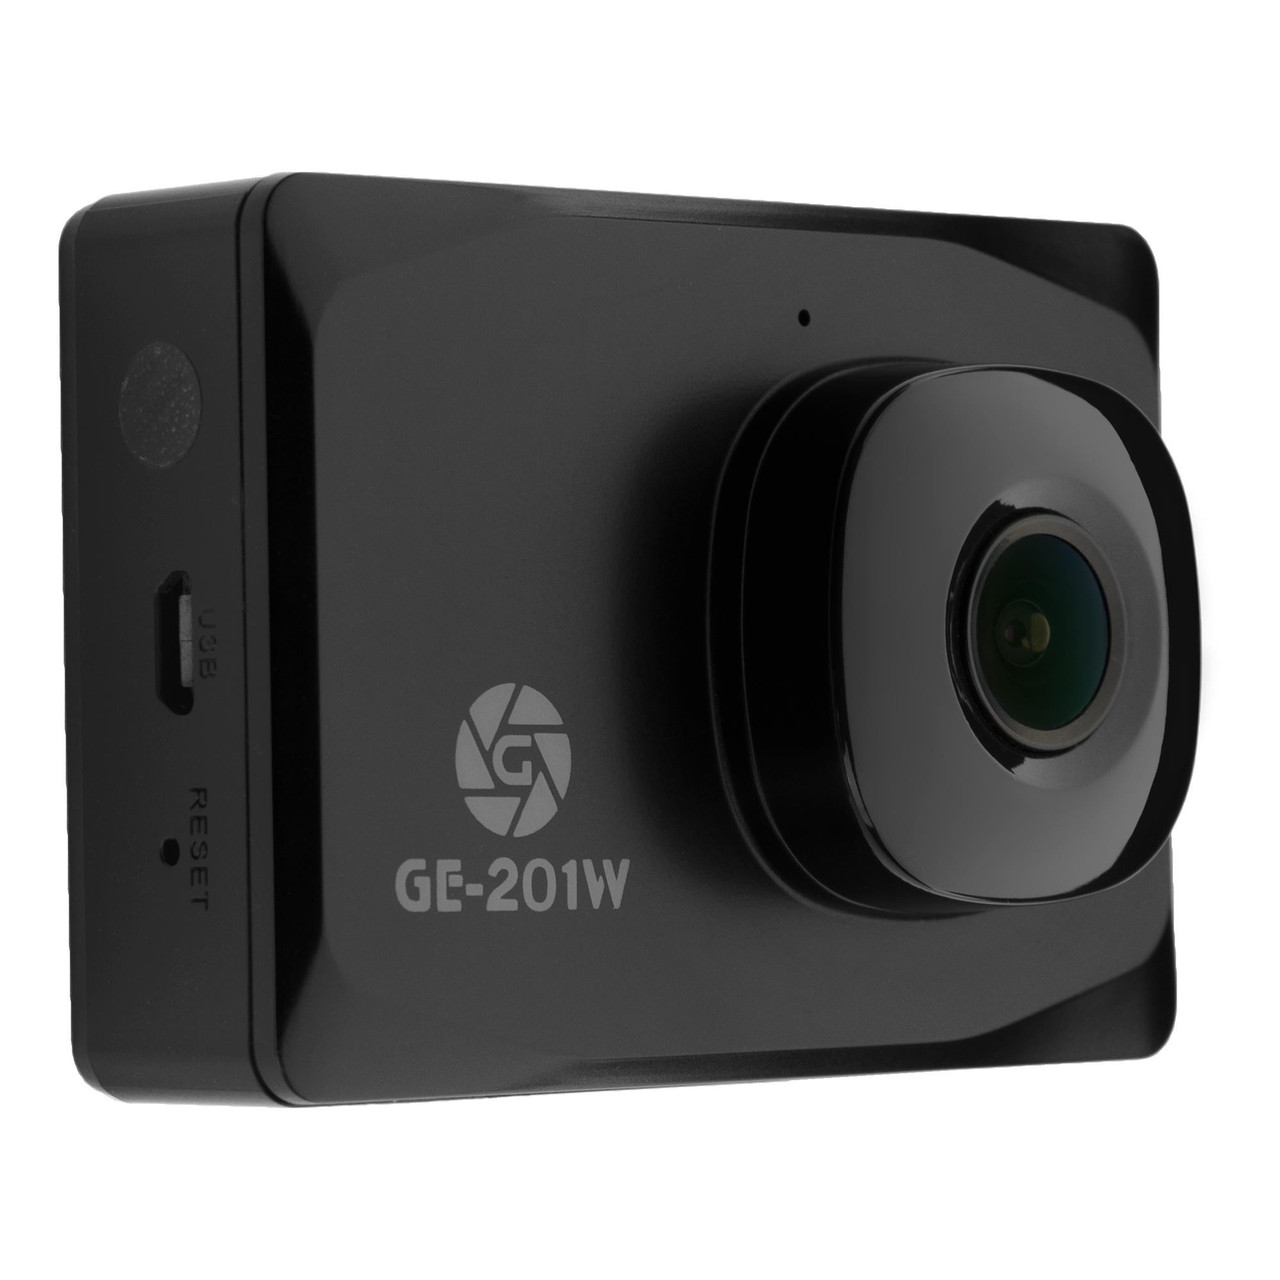 Видеорегистратор Globex GE-201W WiFi (P26198)